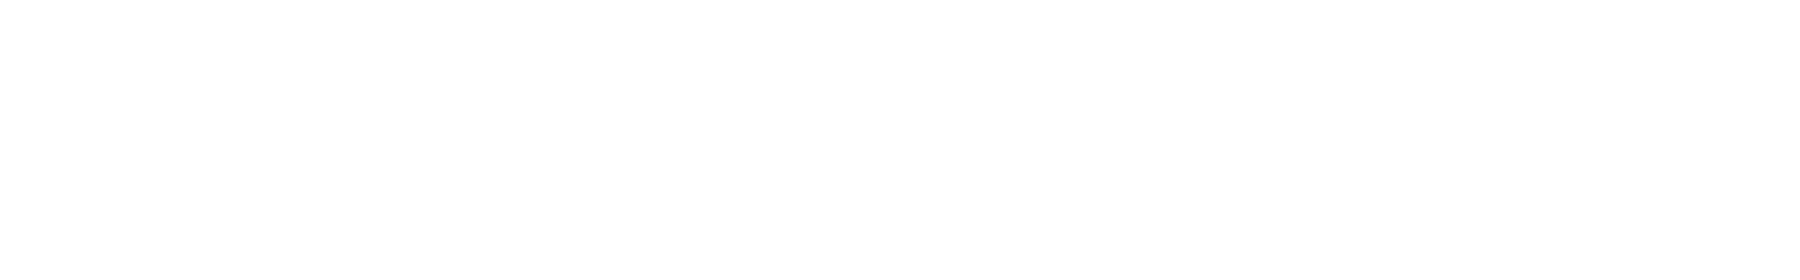 blbc cinedrumsb 130 01